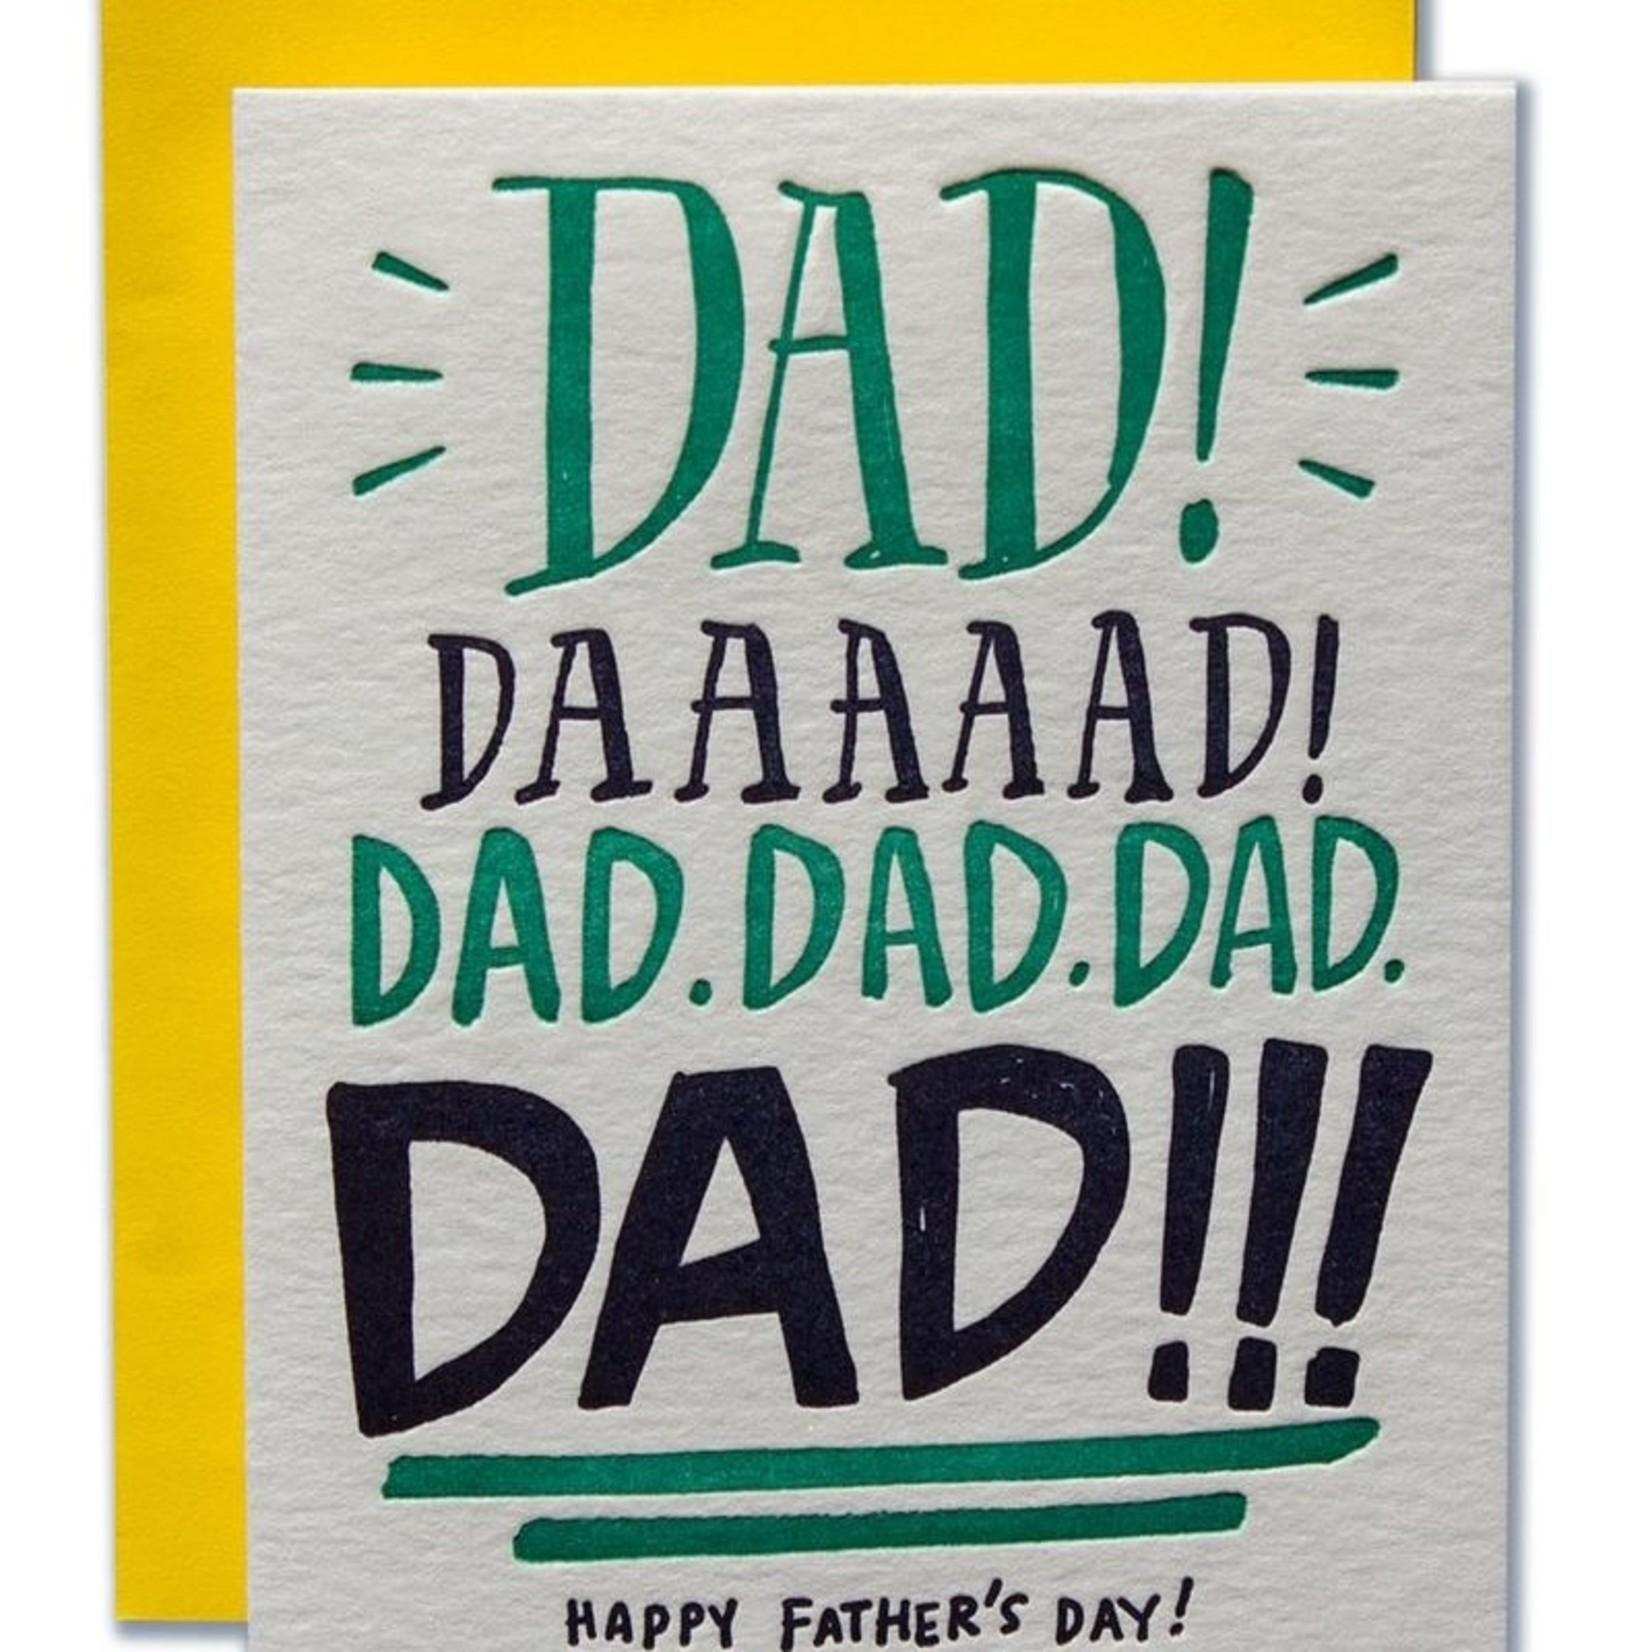 Ladyfingers Letterpress Ladyfingers Dad Yelling Happy Father's Day